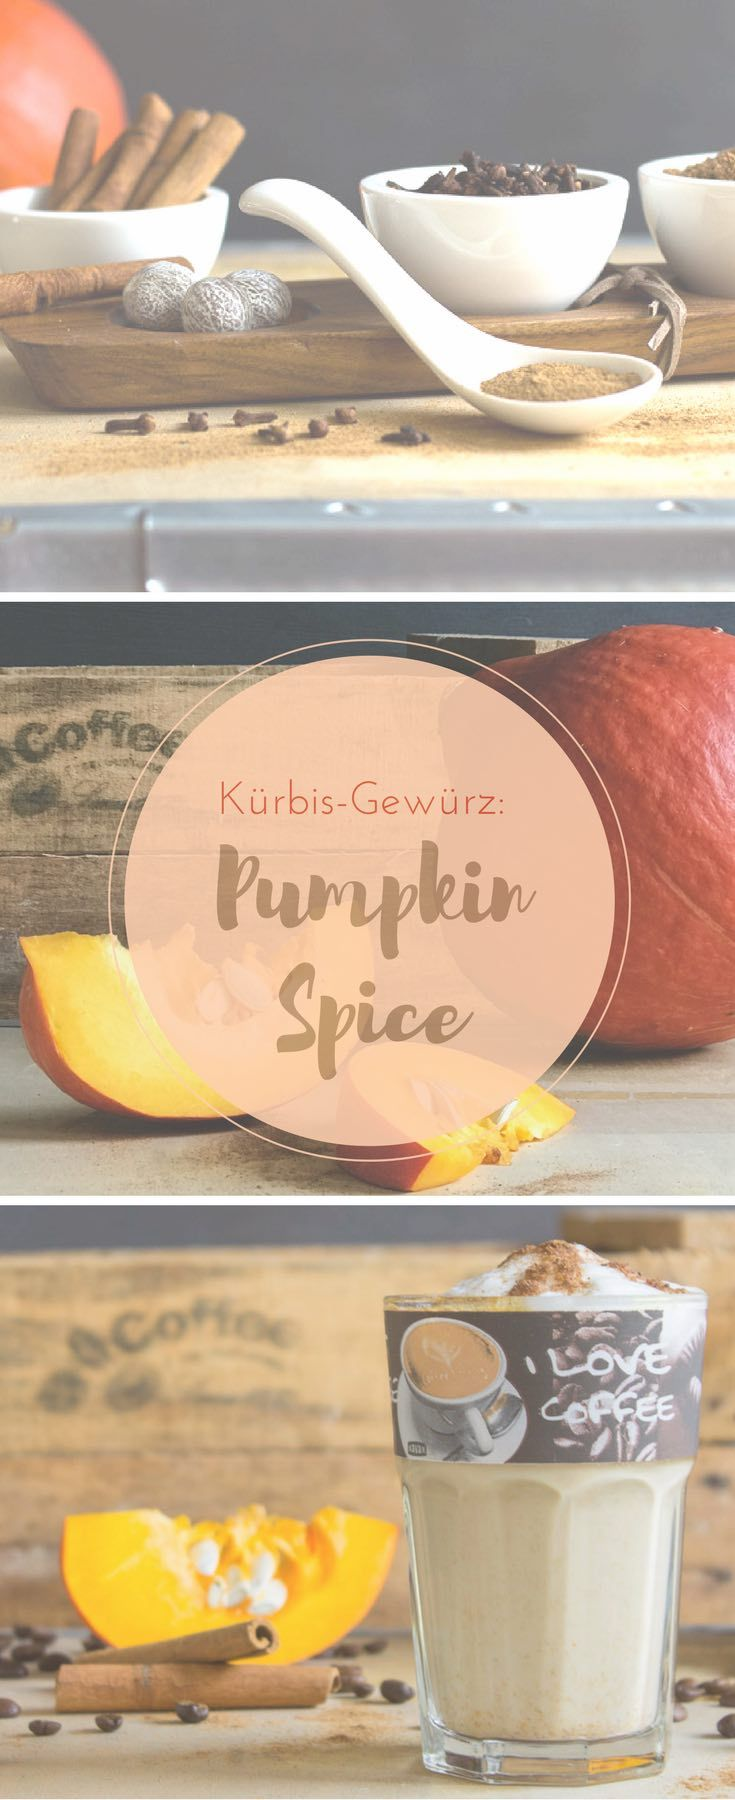 Pumpkin Spice Ideal Fur Alle Rezepte Mit Kurbis Rezepte Mit Kurbis Geschenke Aus Der Kuche Kurbis